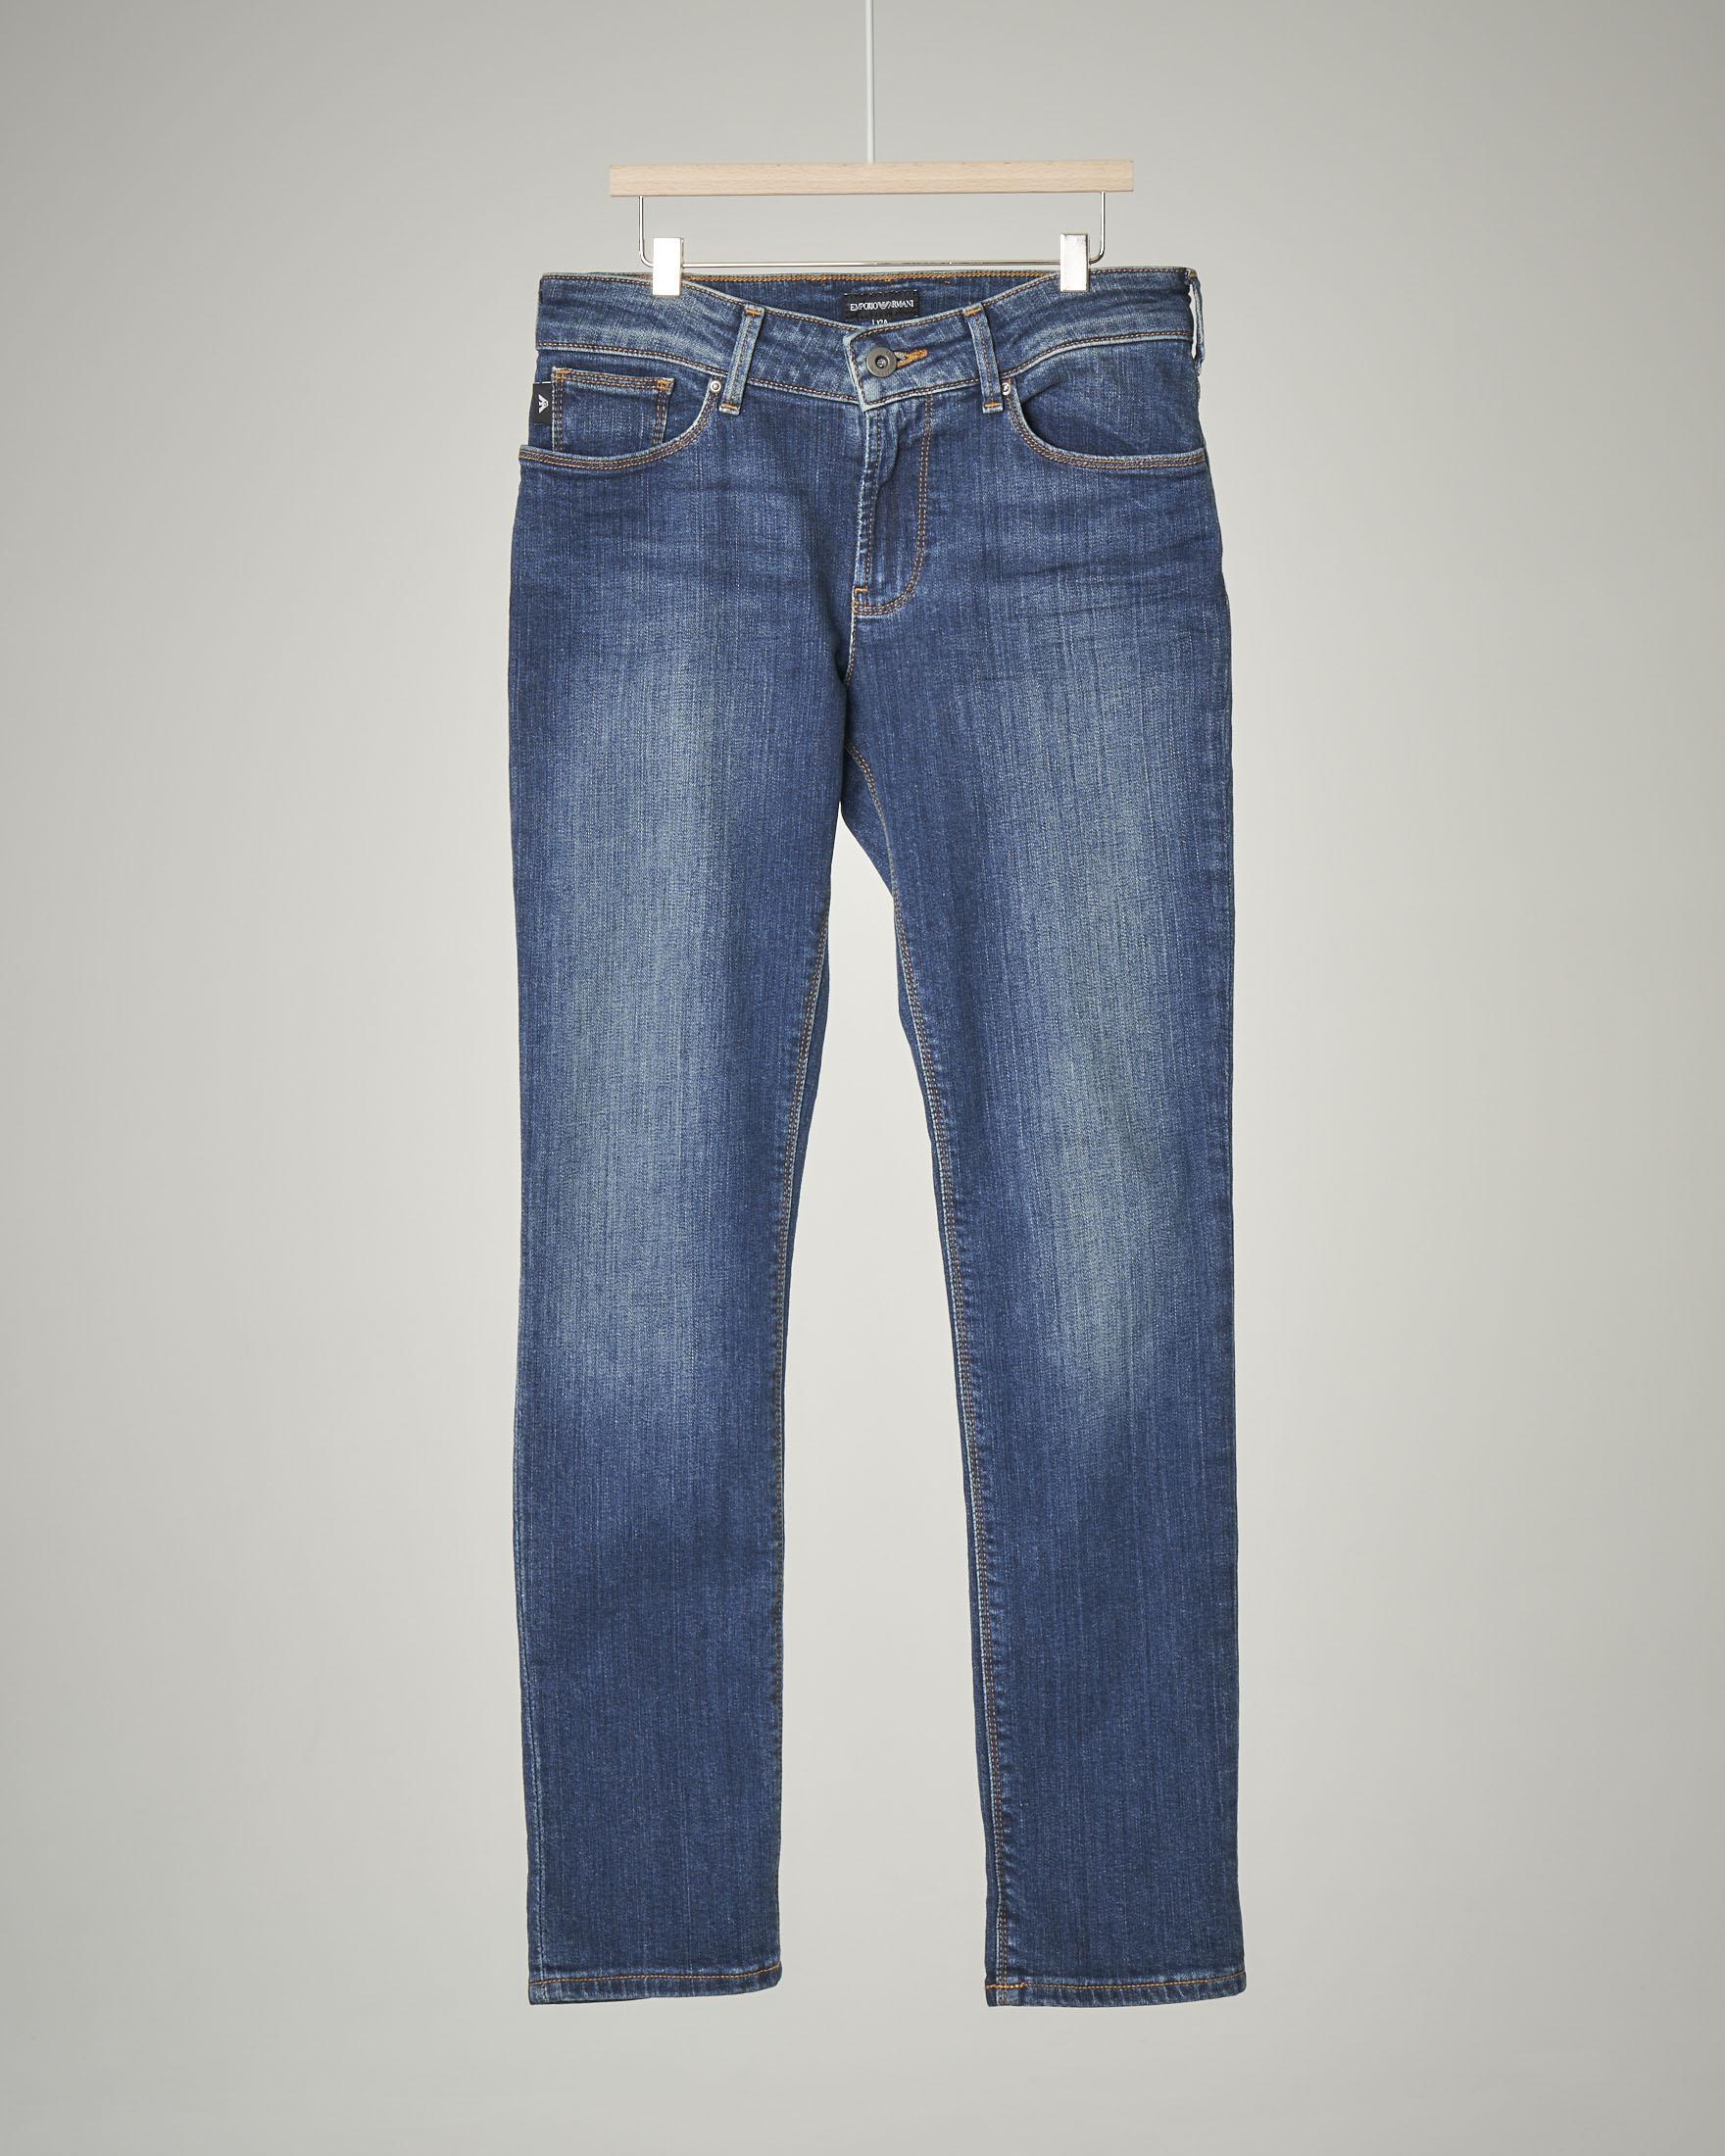 Jeans J06 stone wash 10-16 anni